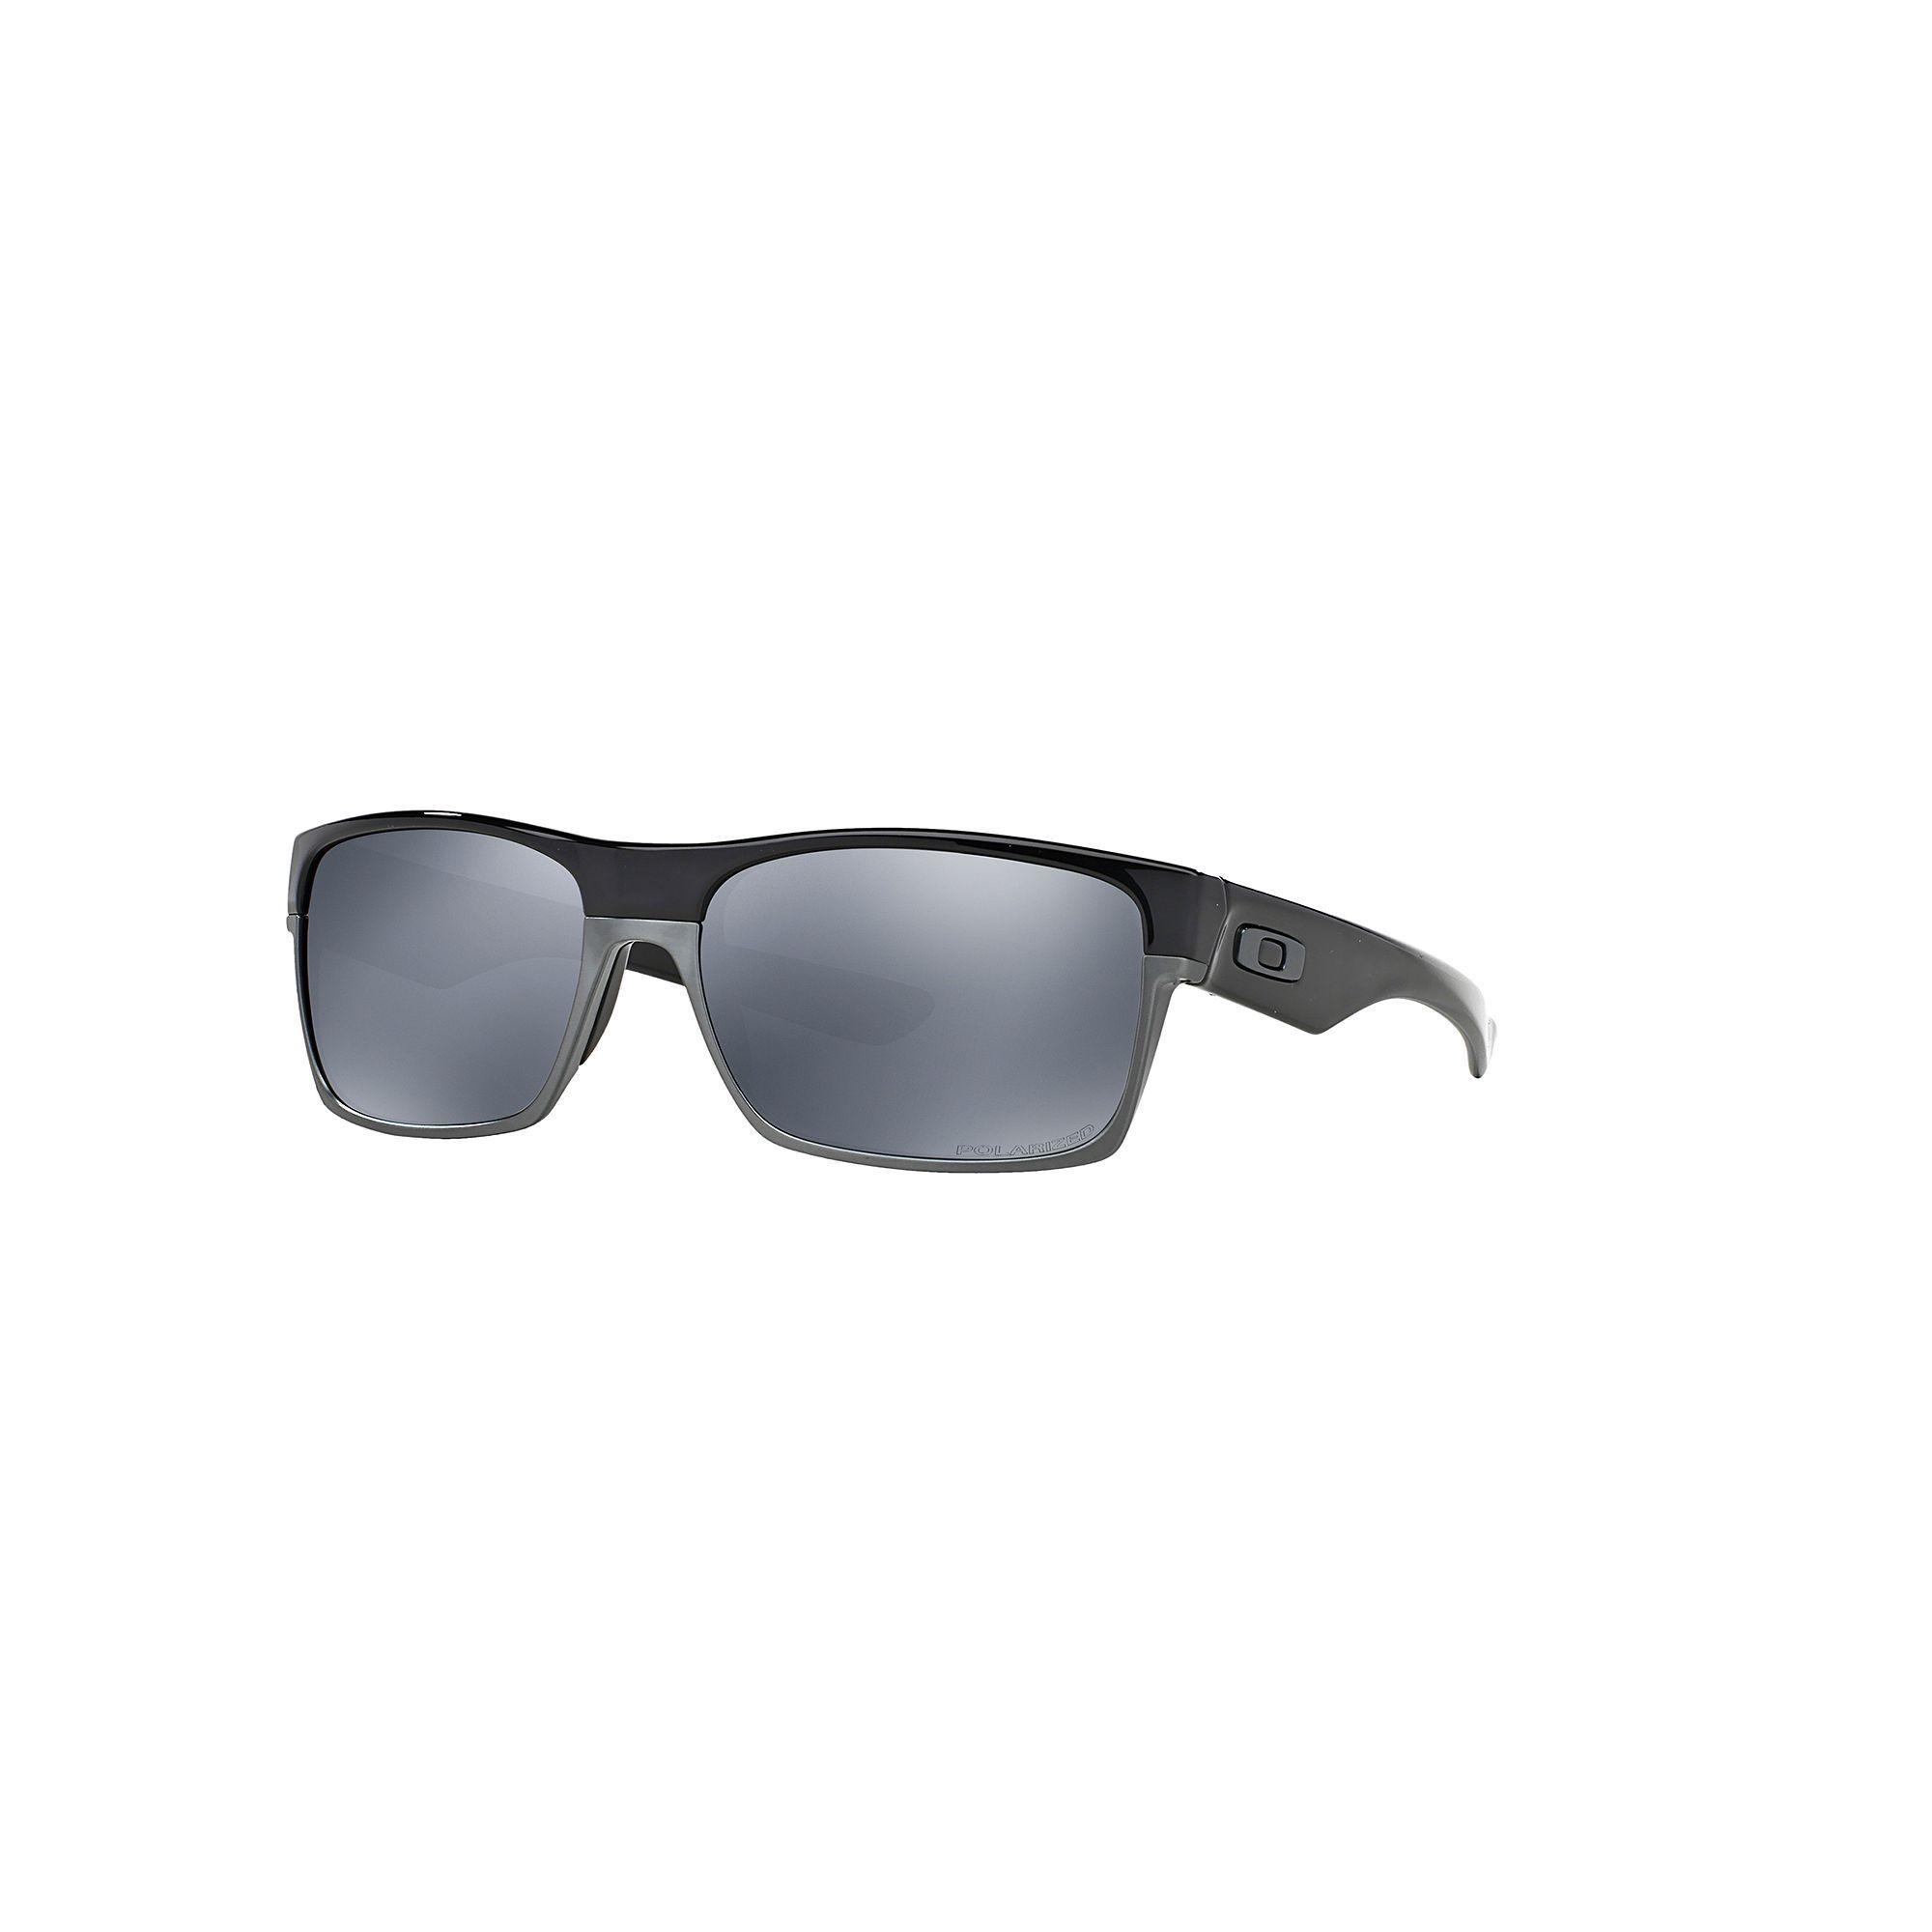 2de5df5e115f6 Oakley Twoface OO9189 60mm Rectangle Black Iridium Polarized Sunglasses,  Men s